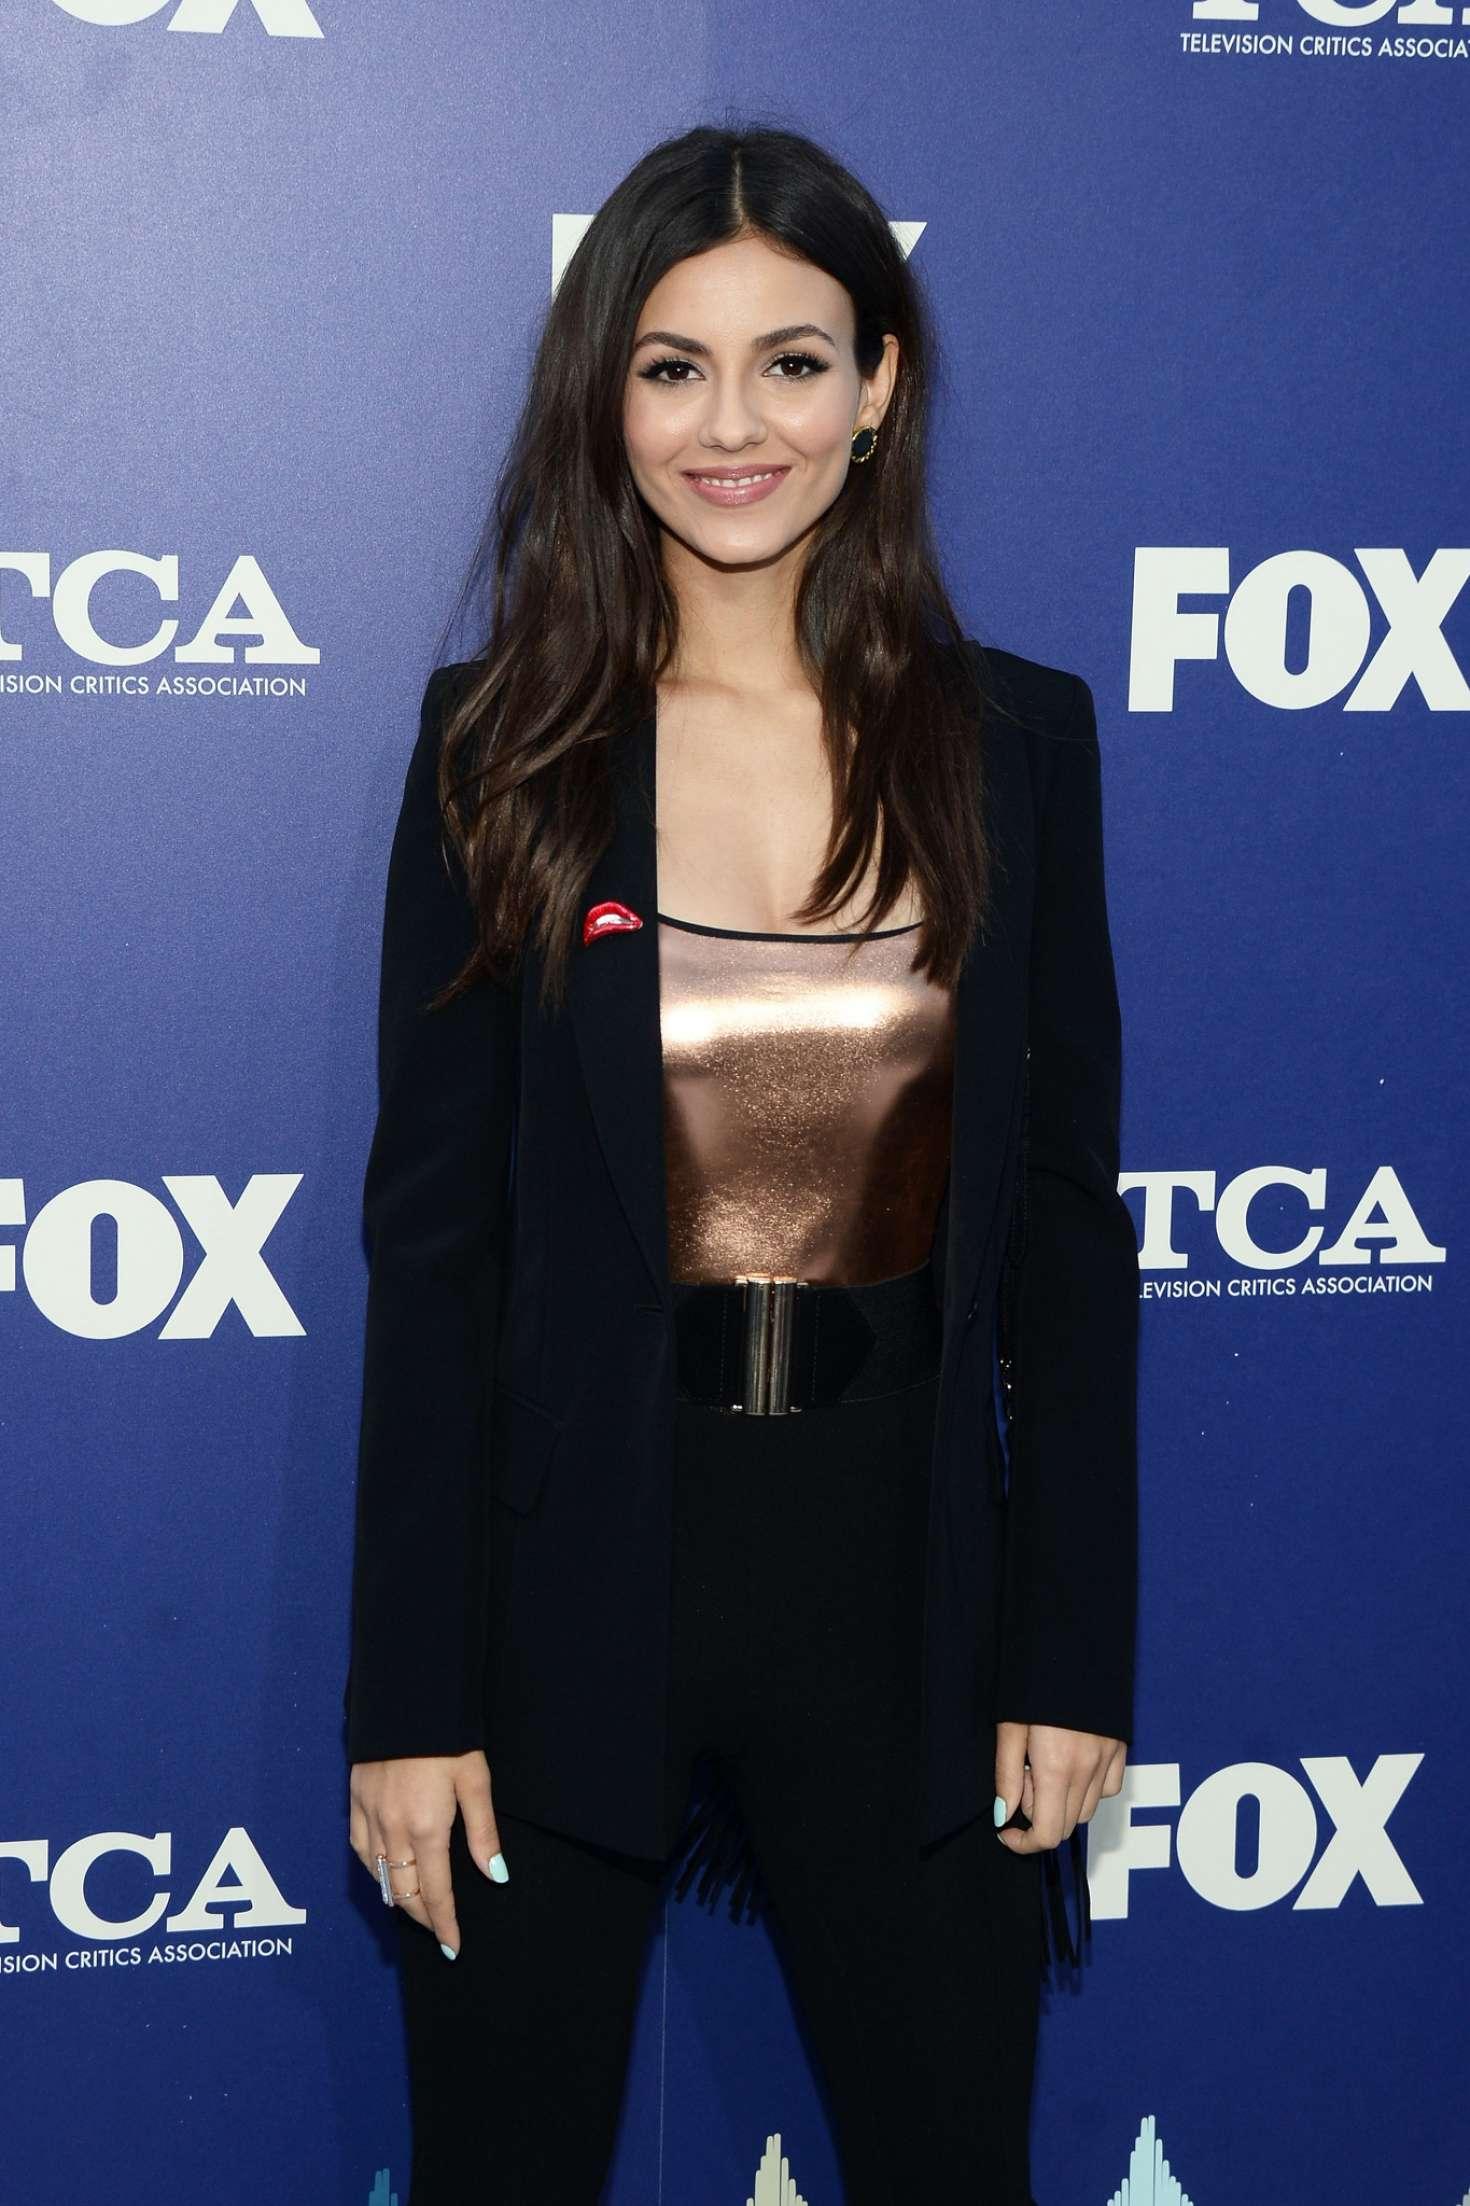 Victoria Justice 2016 : Victoria Justice: FOX 2016 Summer TCA All-Star Party -04